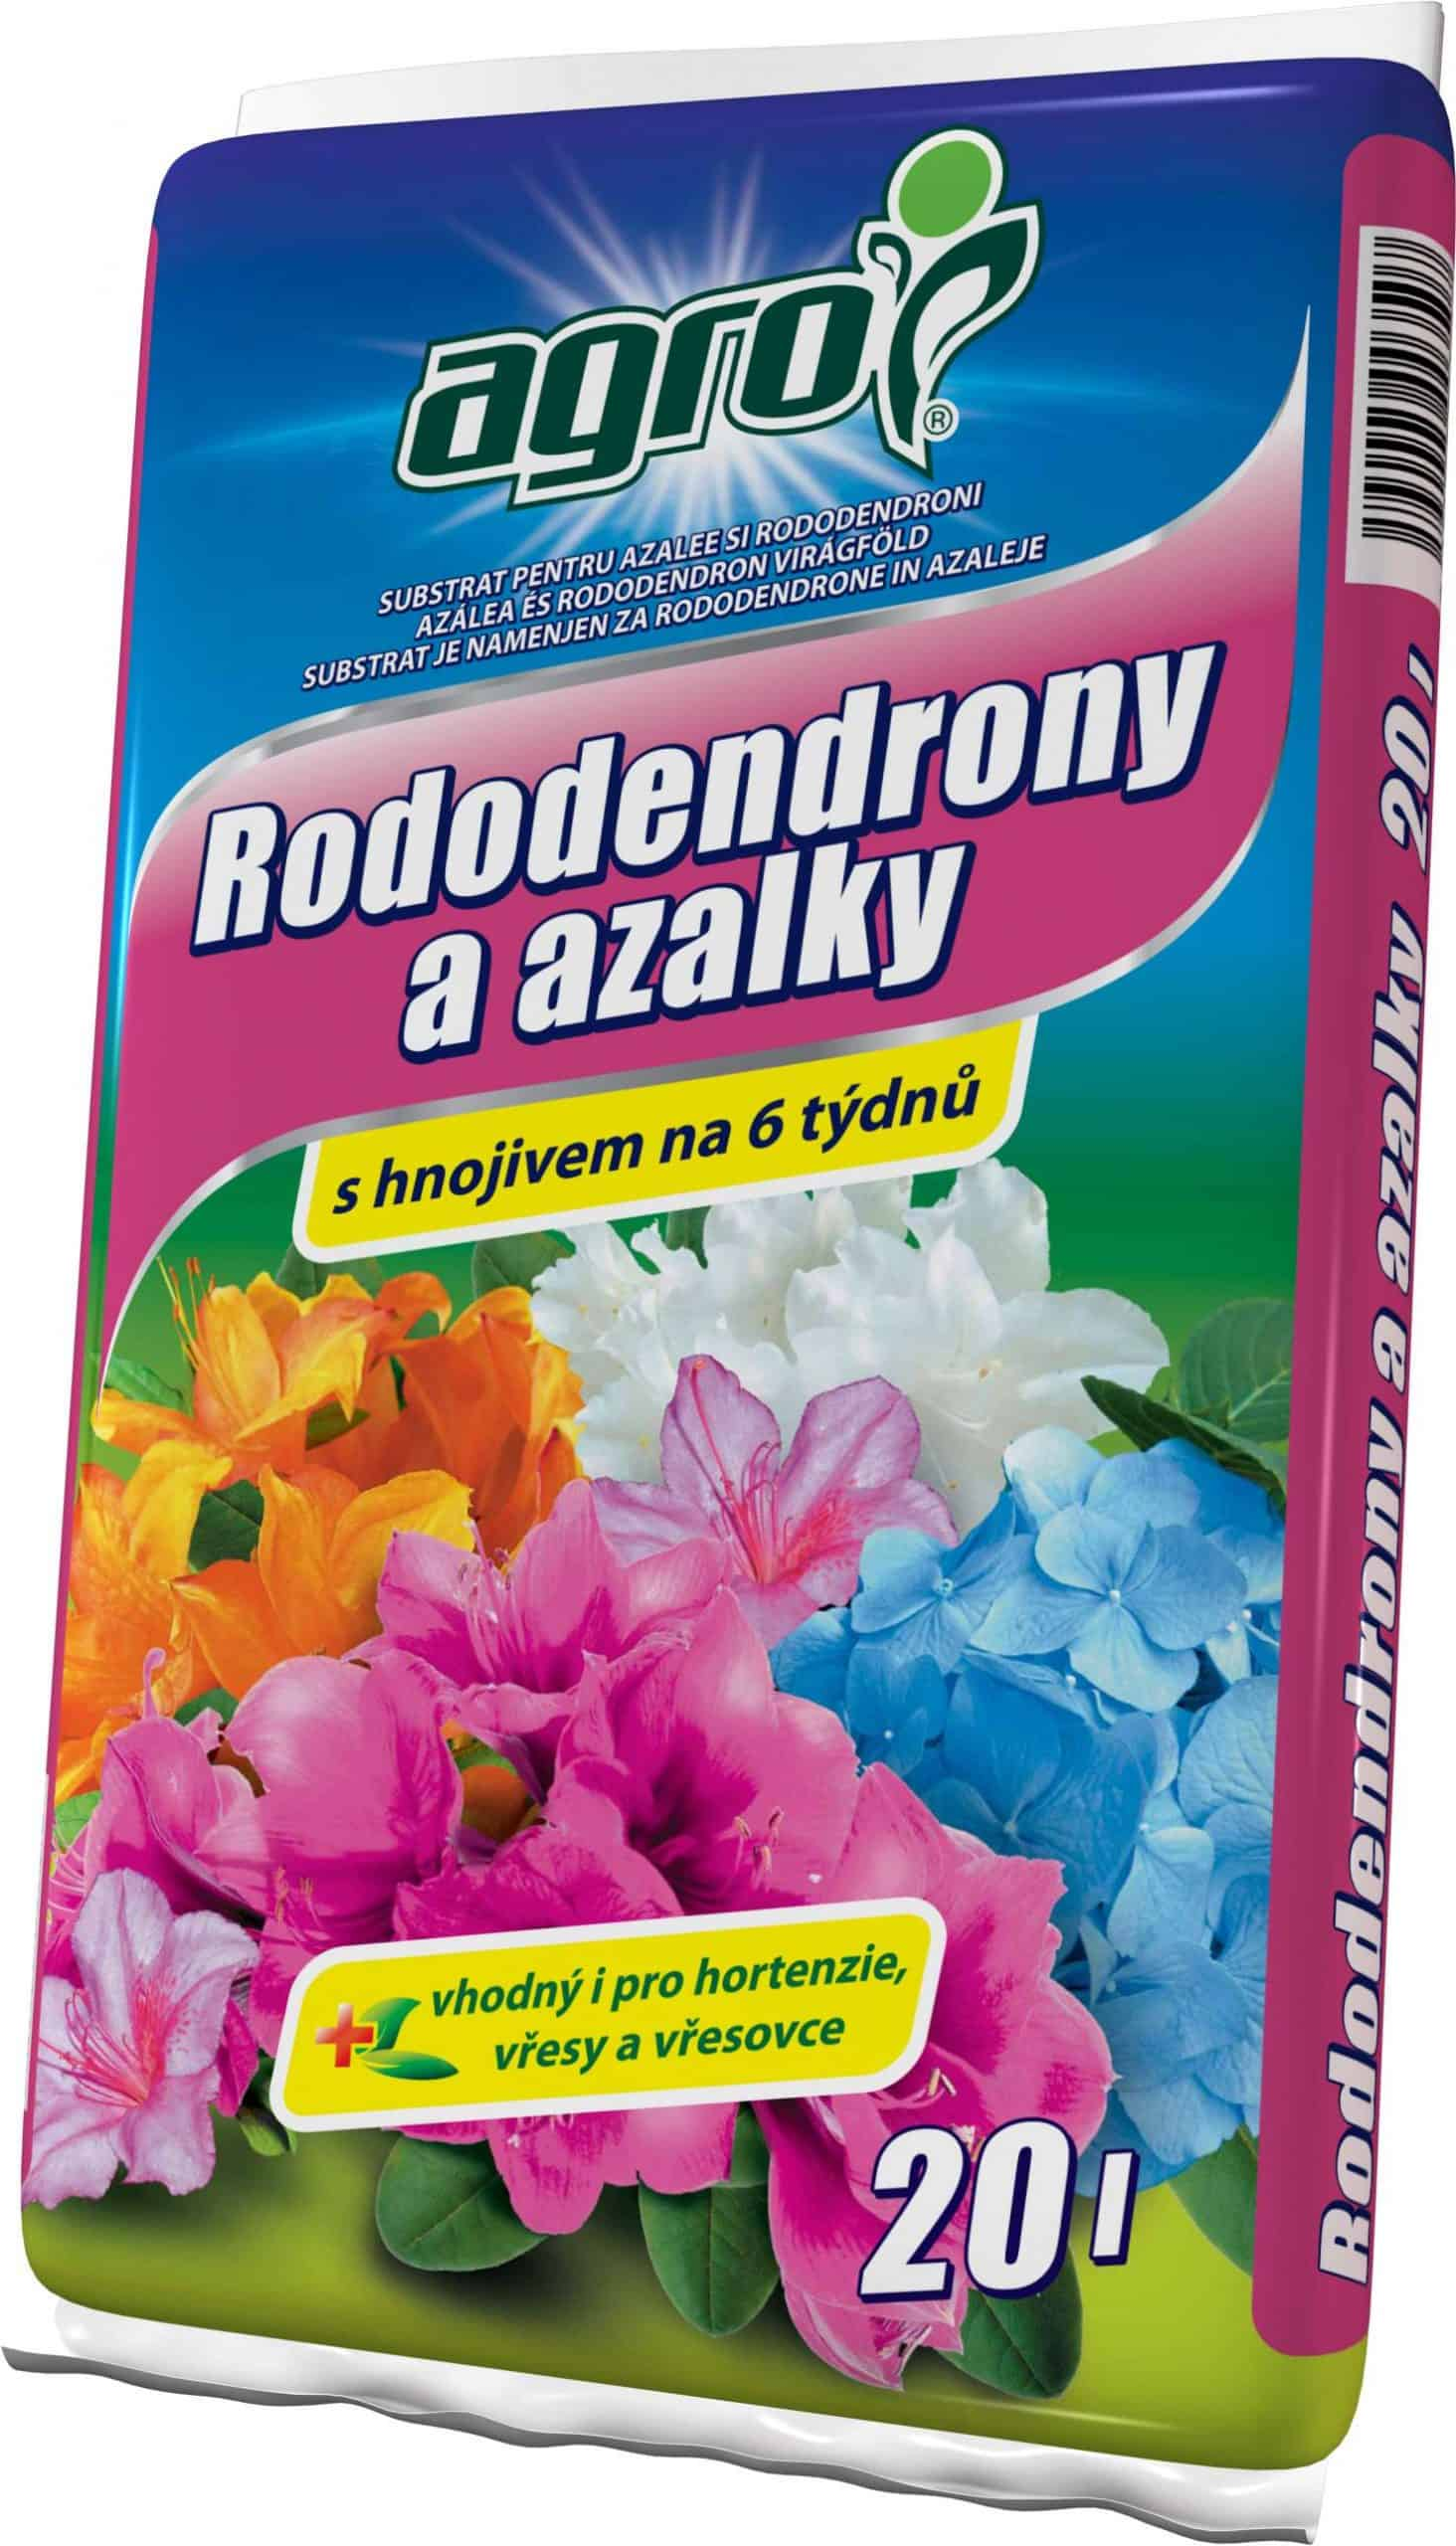 AGRO Substrát na azalky a rododendróny 20l